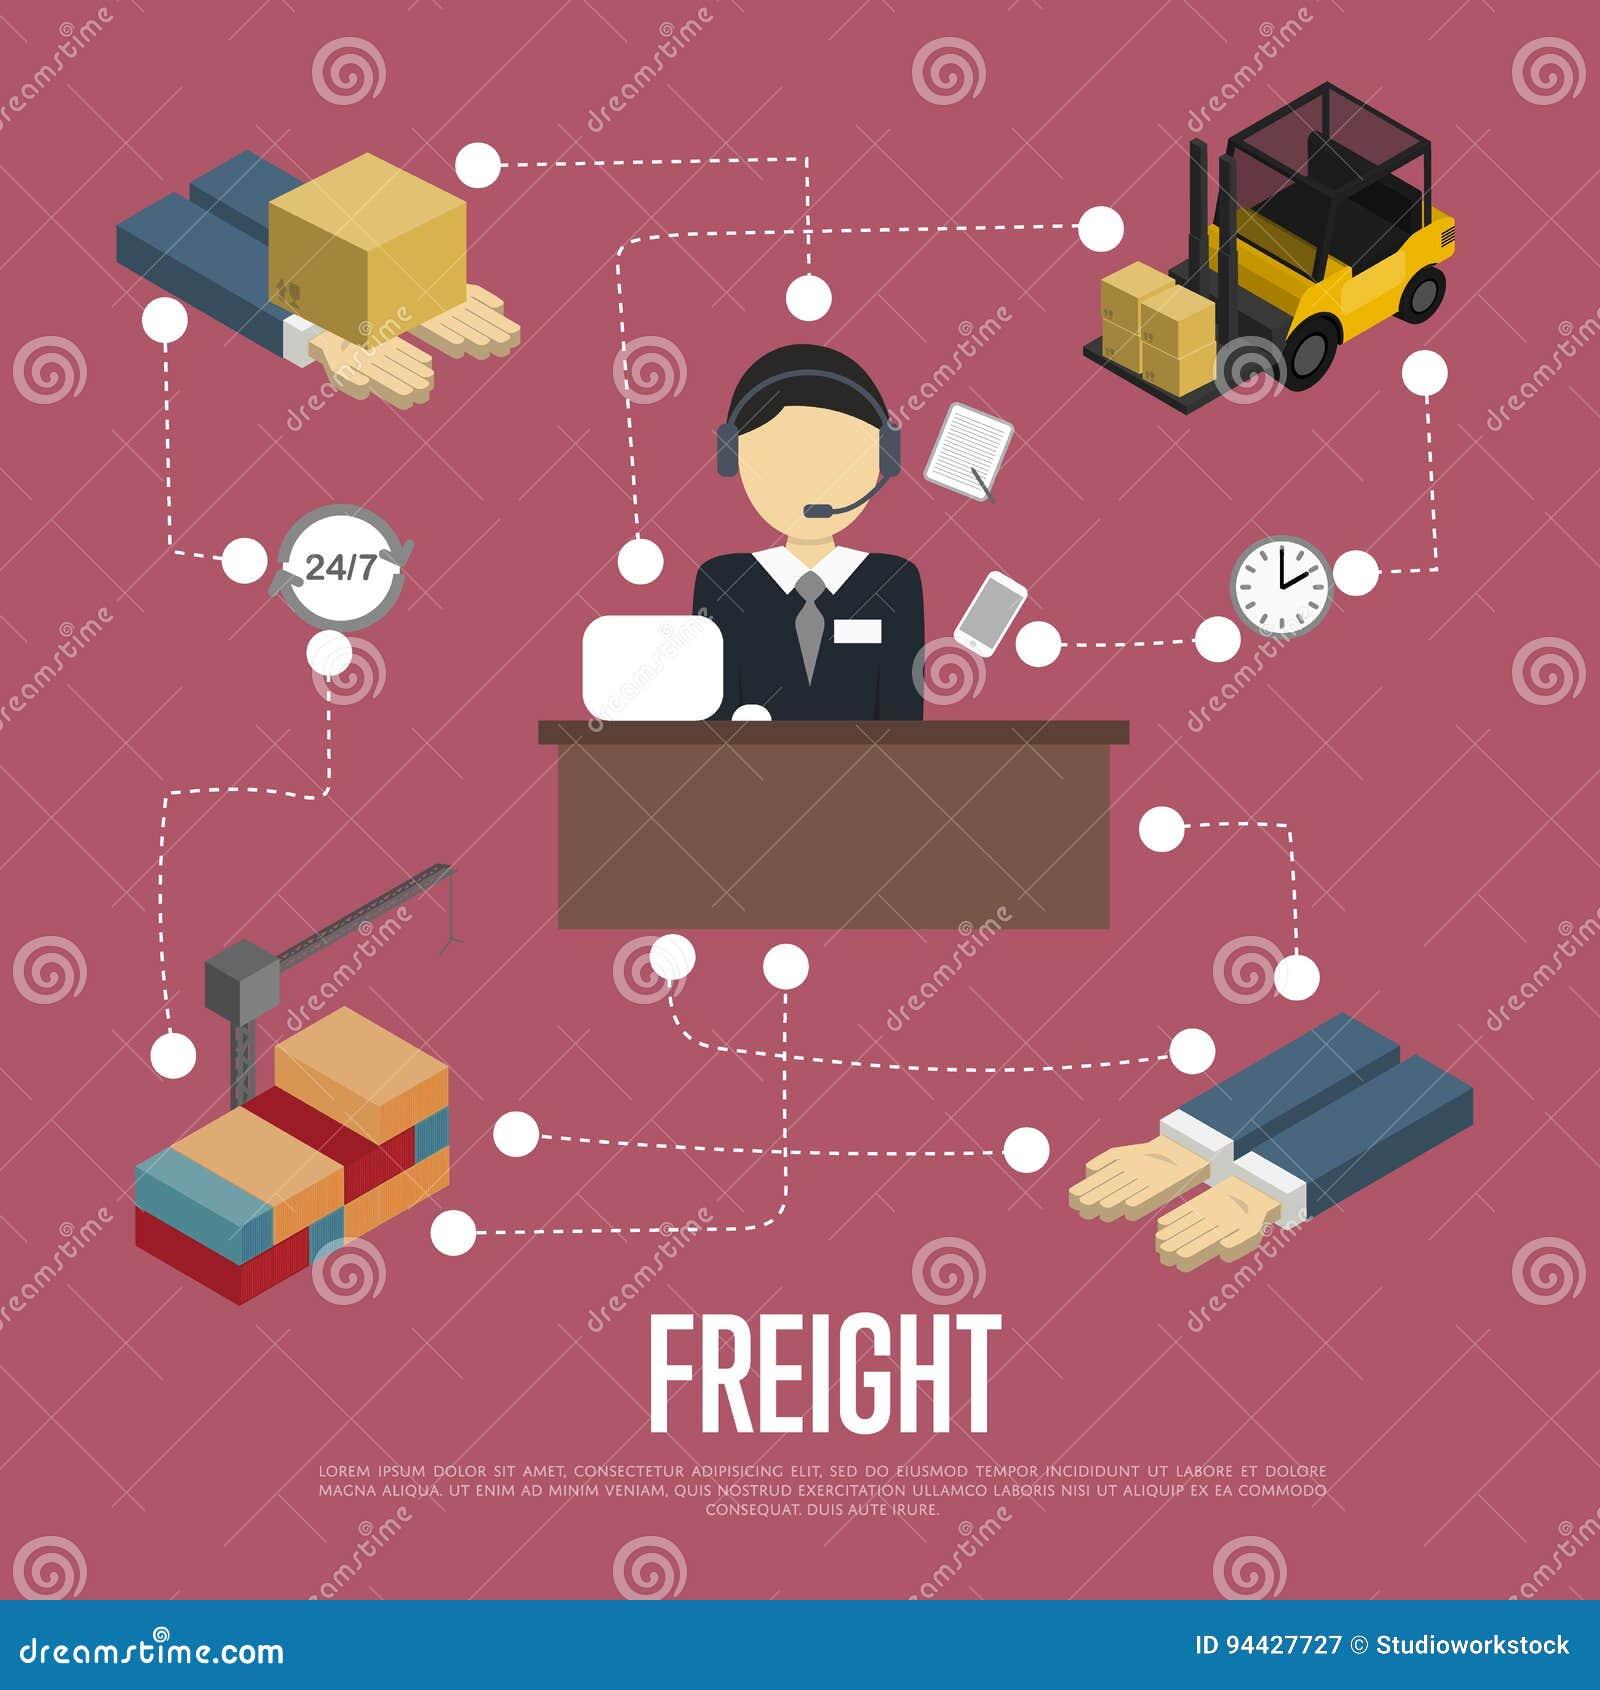 Logistics And Freight Shipment Flowchart Stock Vector - Illustration